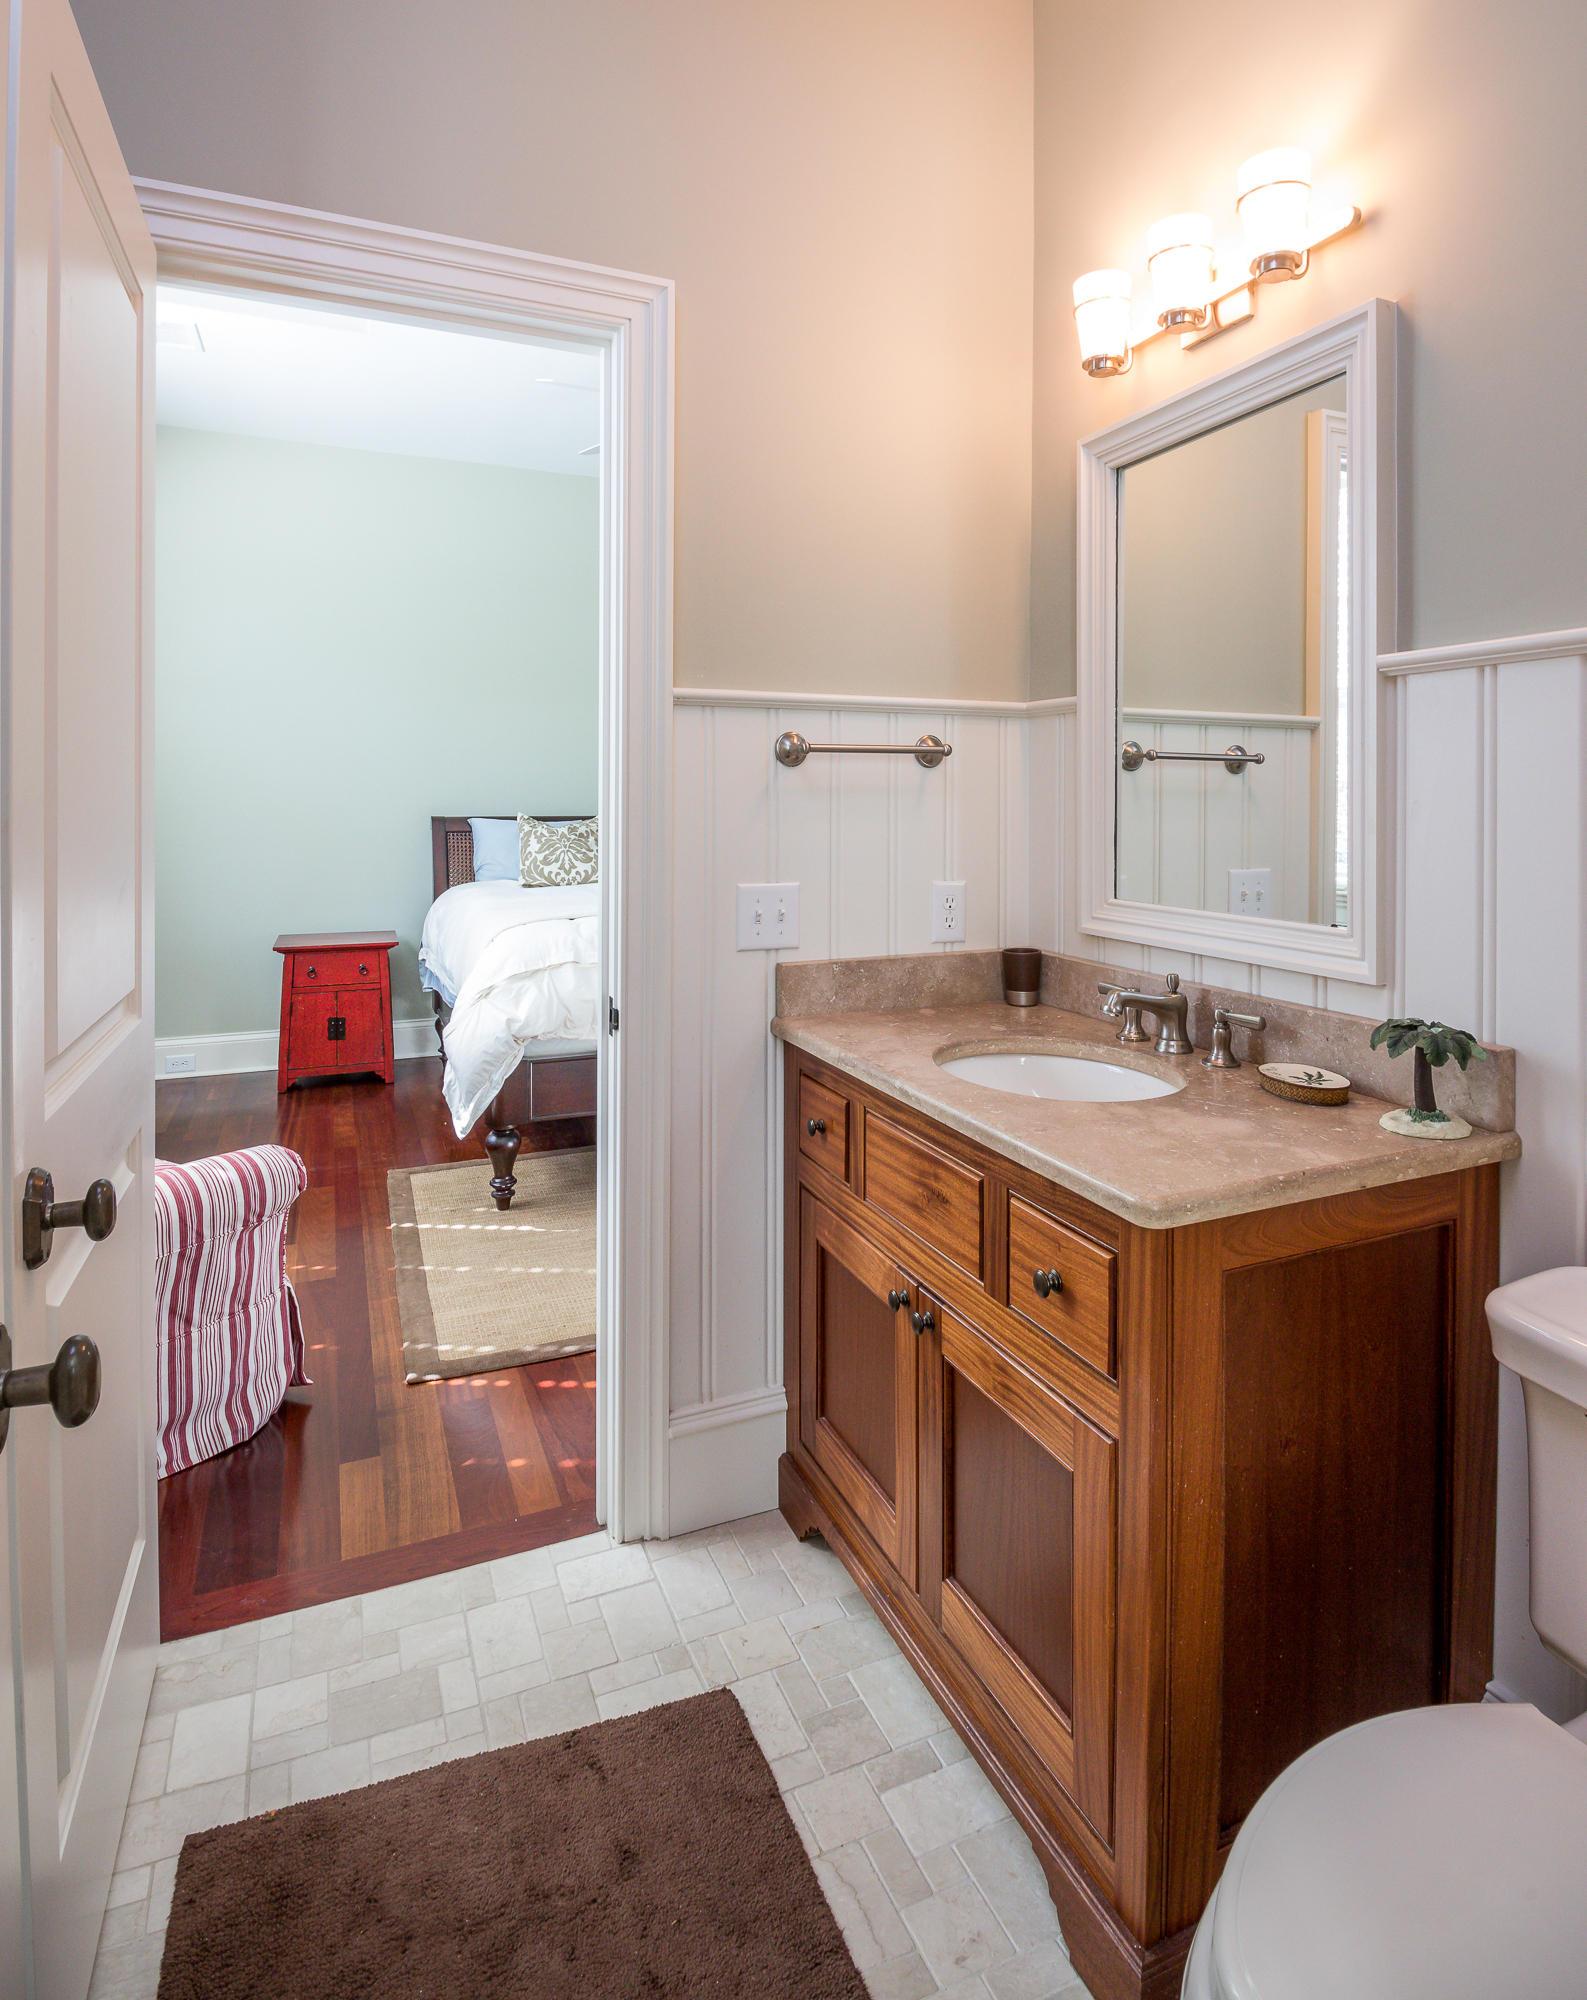 Egret/Pintail Homes For Sale - 117 Bufflehead, Kiawah Island, SC - 24